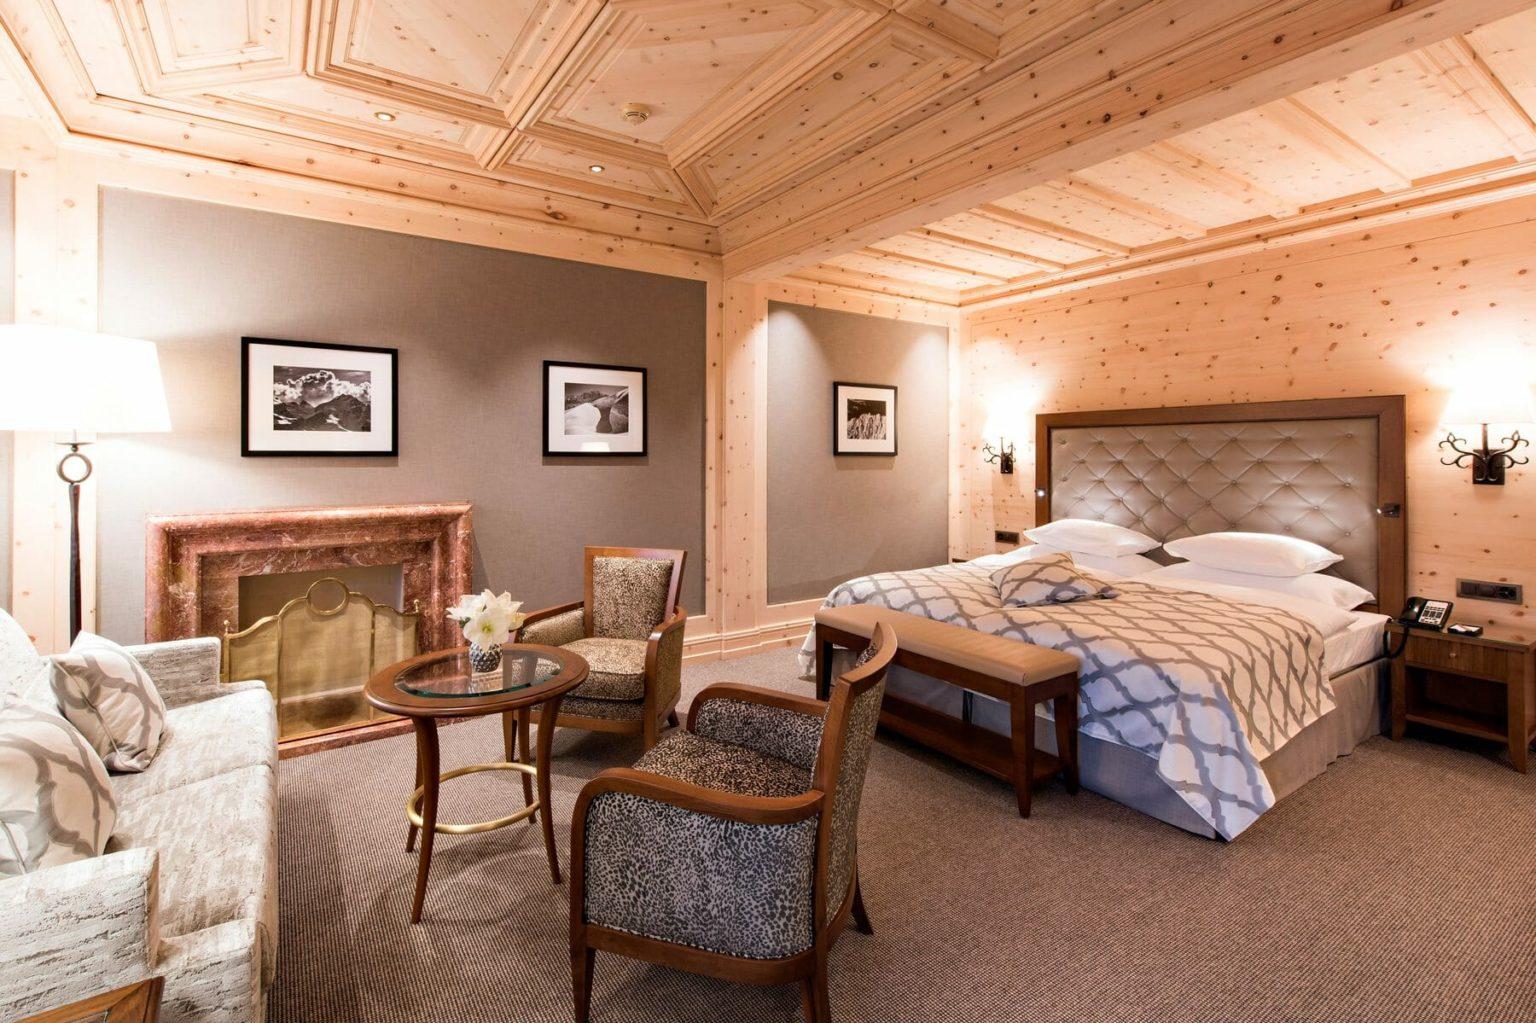 Kulm-Hotel-StMoritz_Deluxe-Doppelzimmer-mit-Kamin-1800x1199